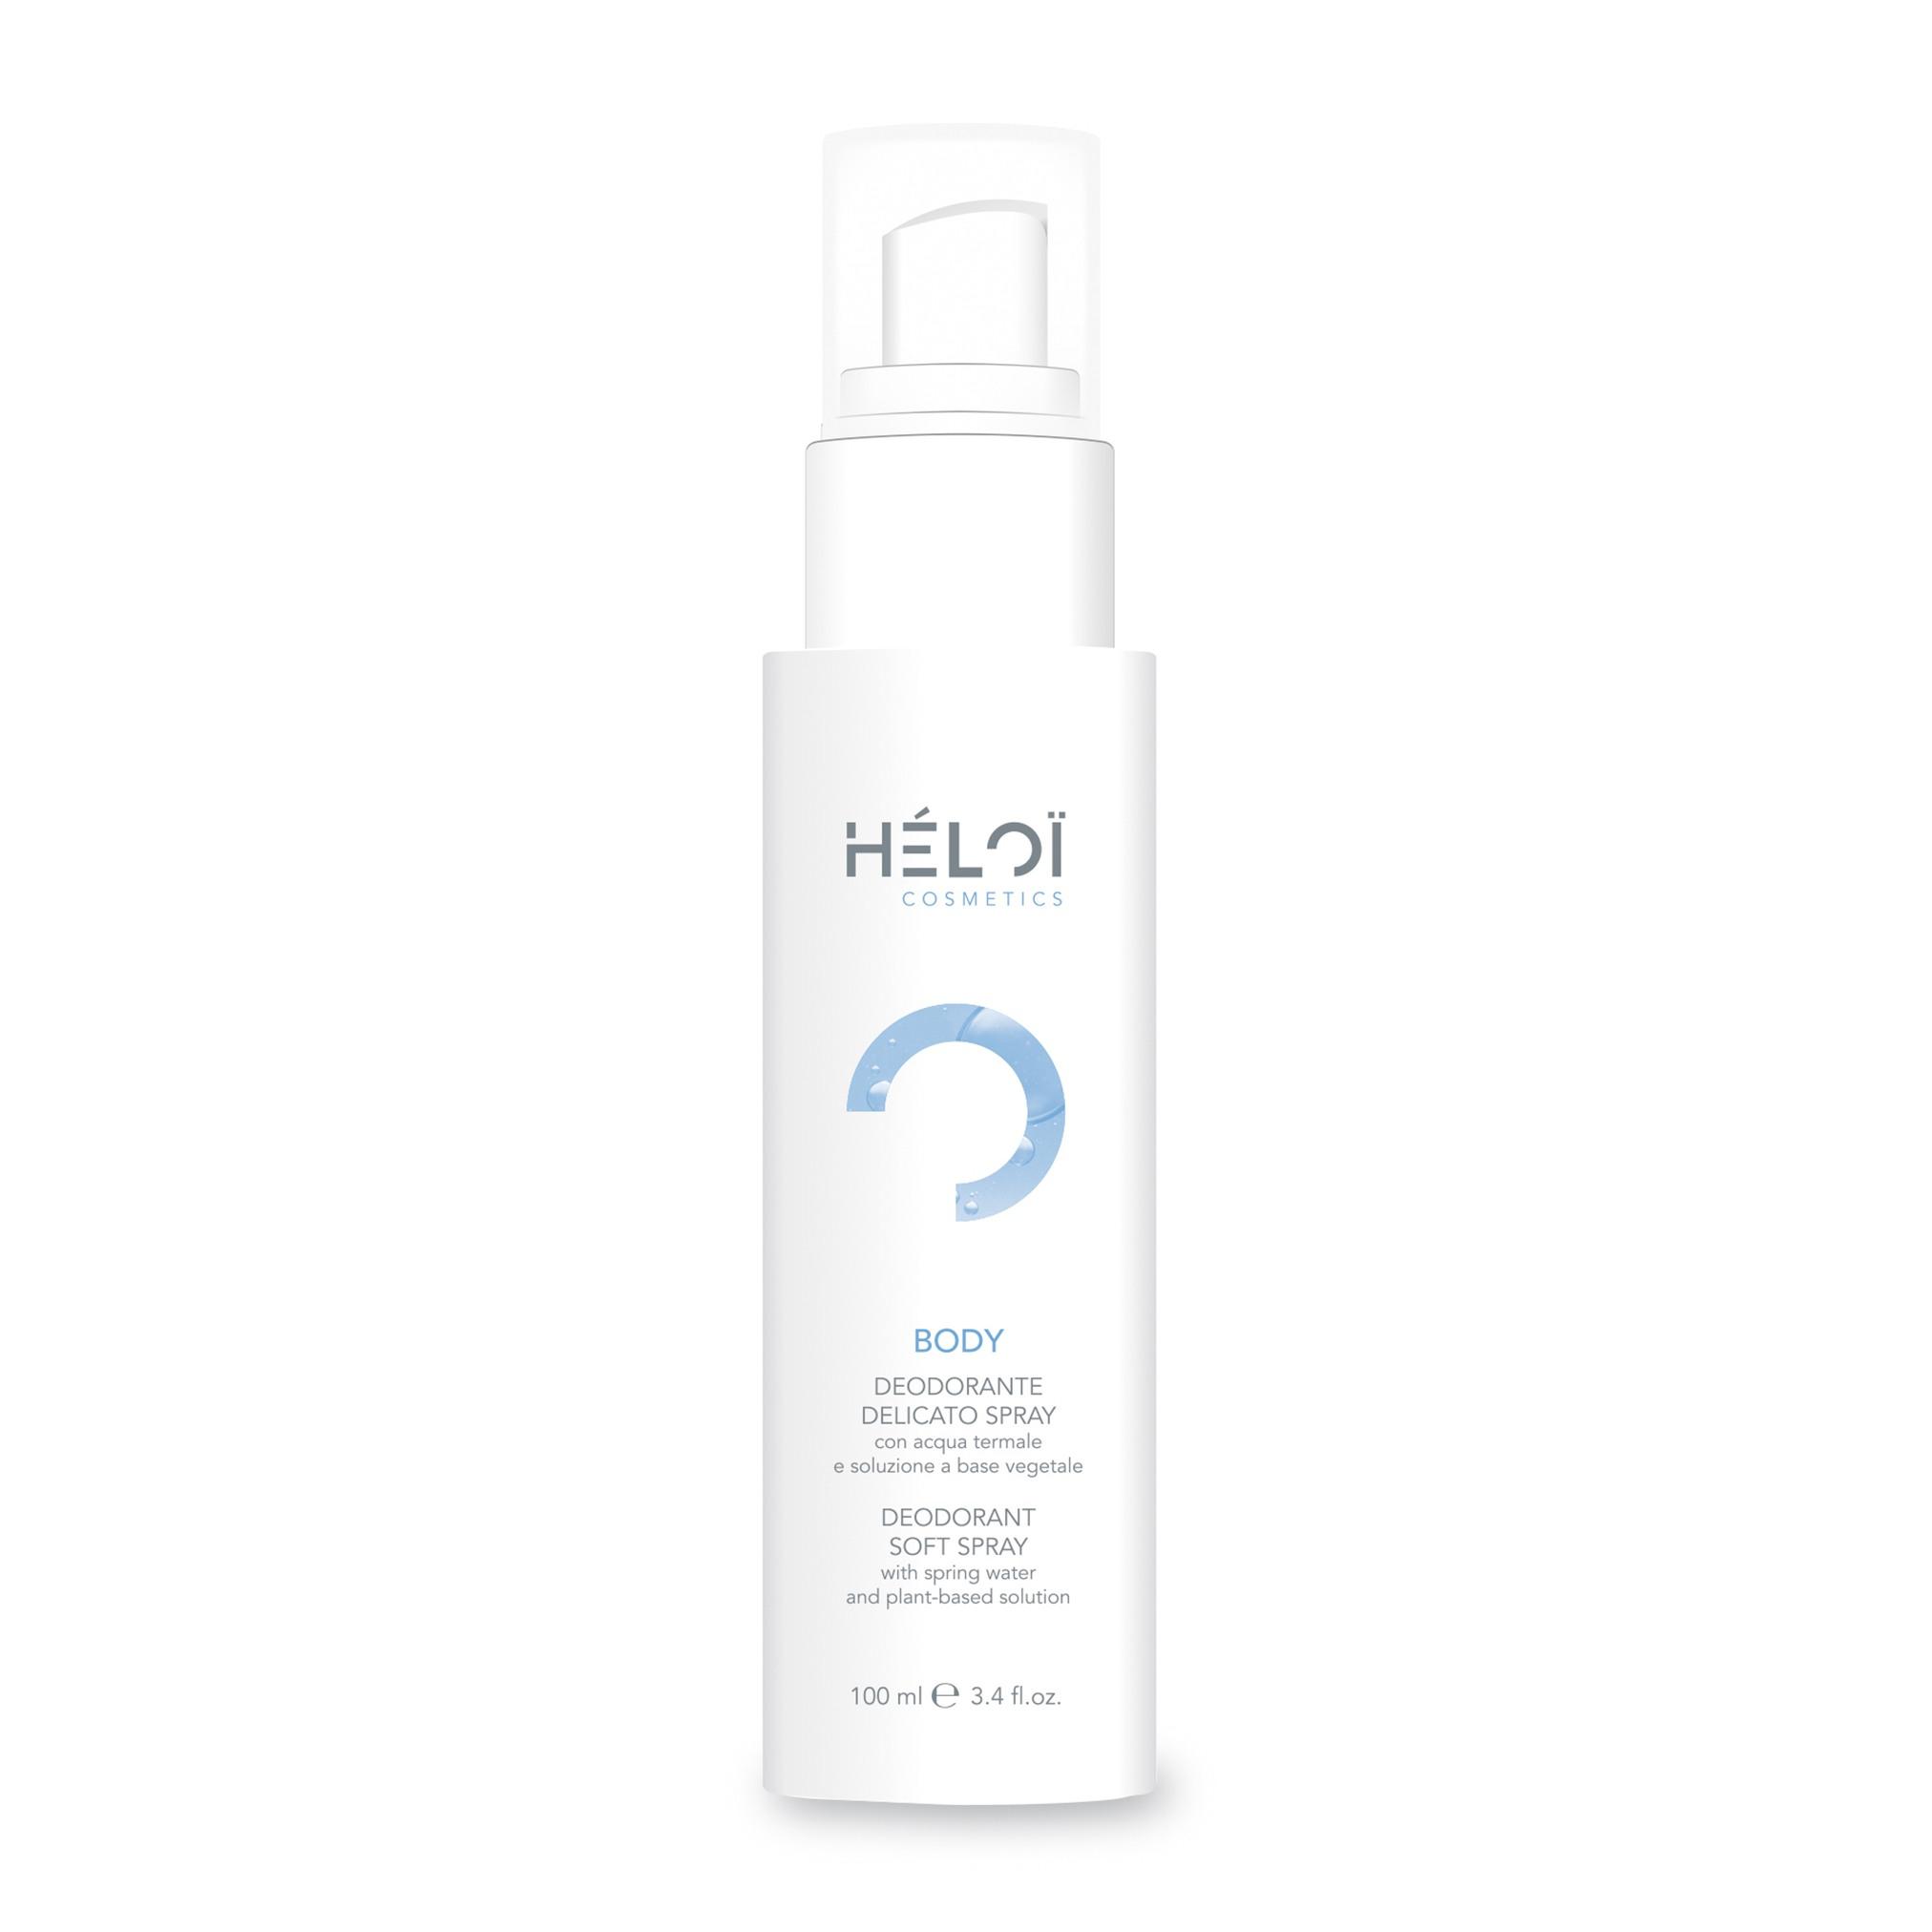 Deodorante delicato spray